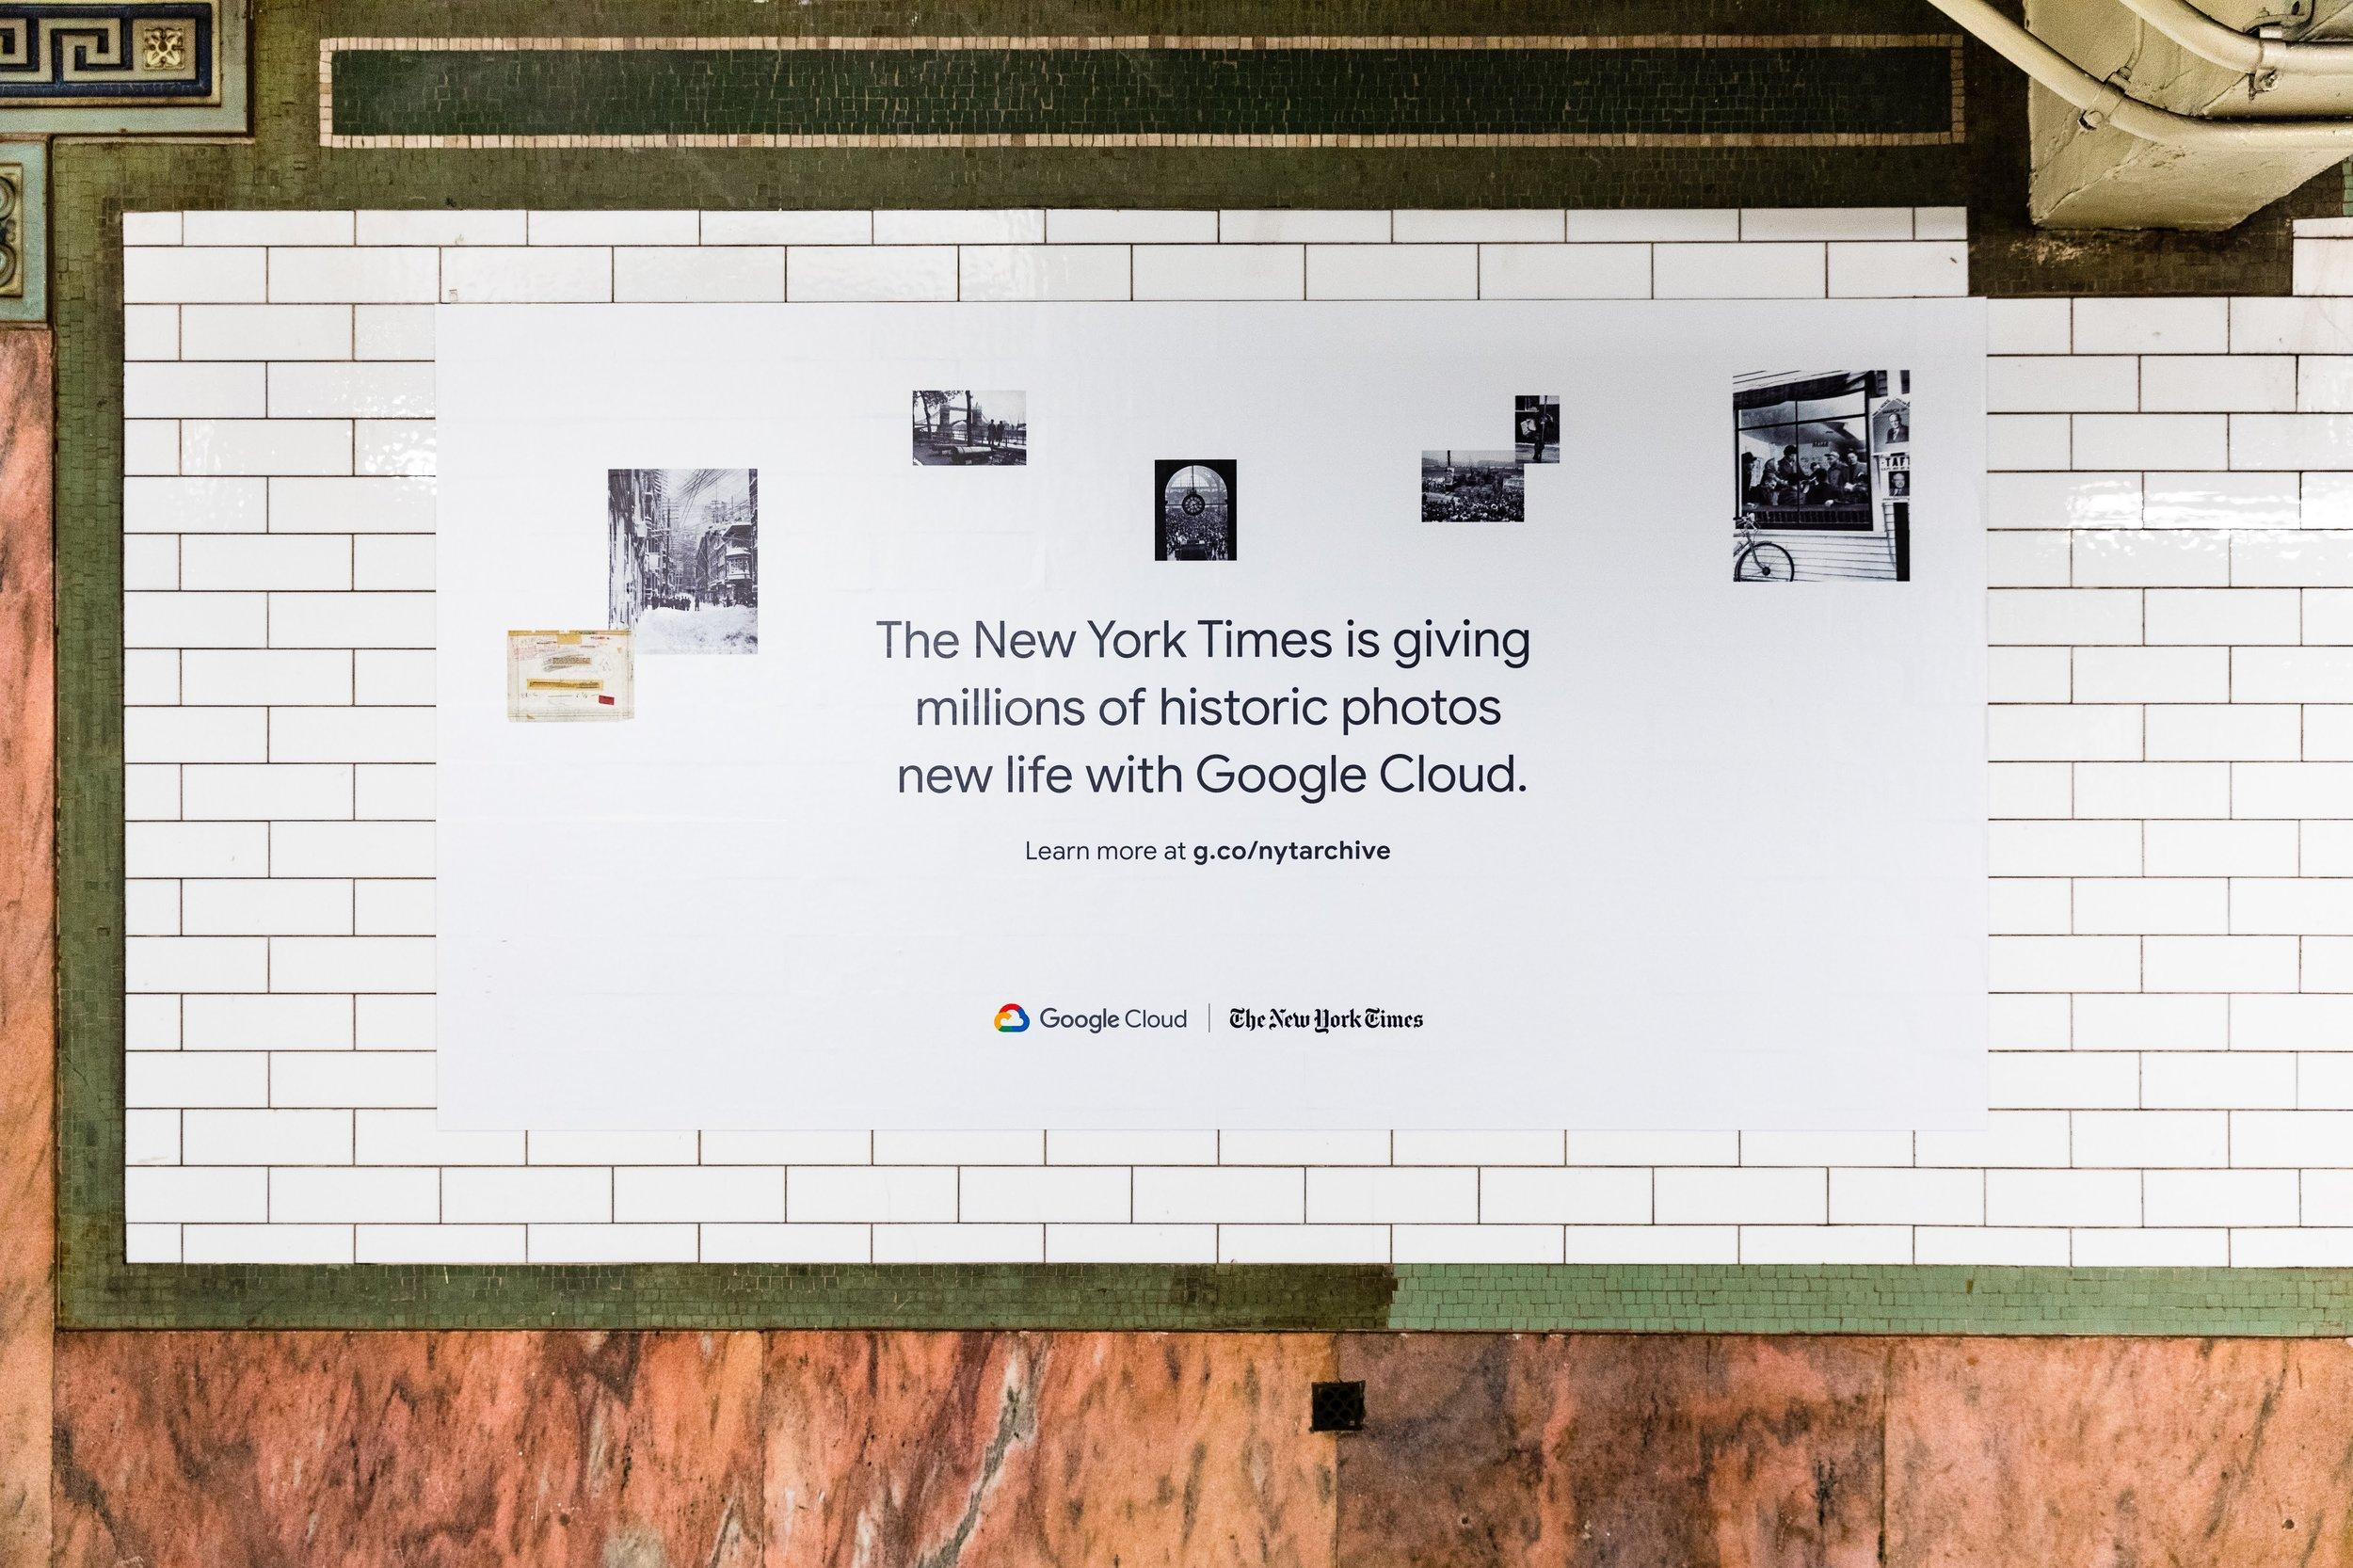 Google_Wall Street-8611.jpg